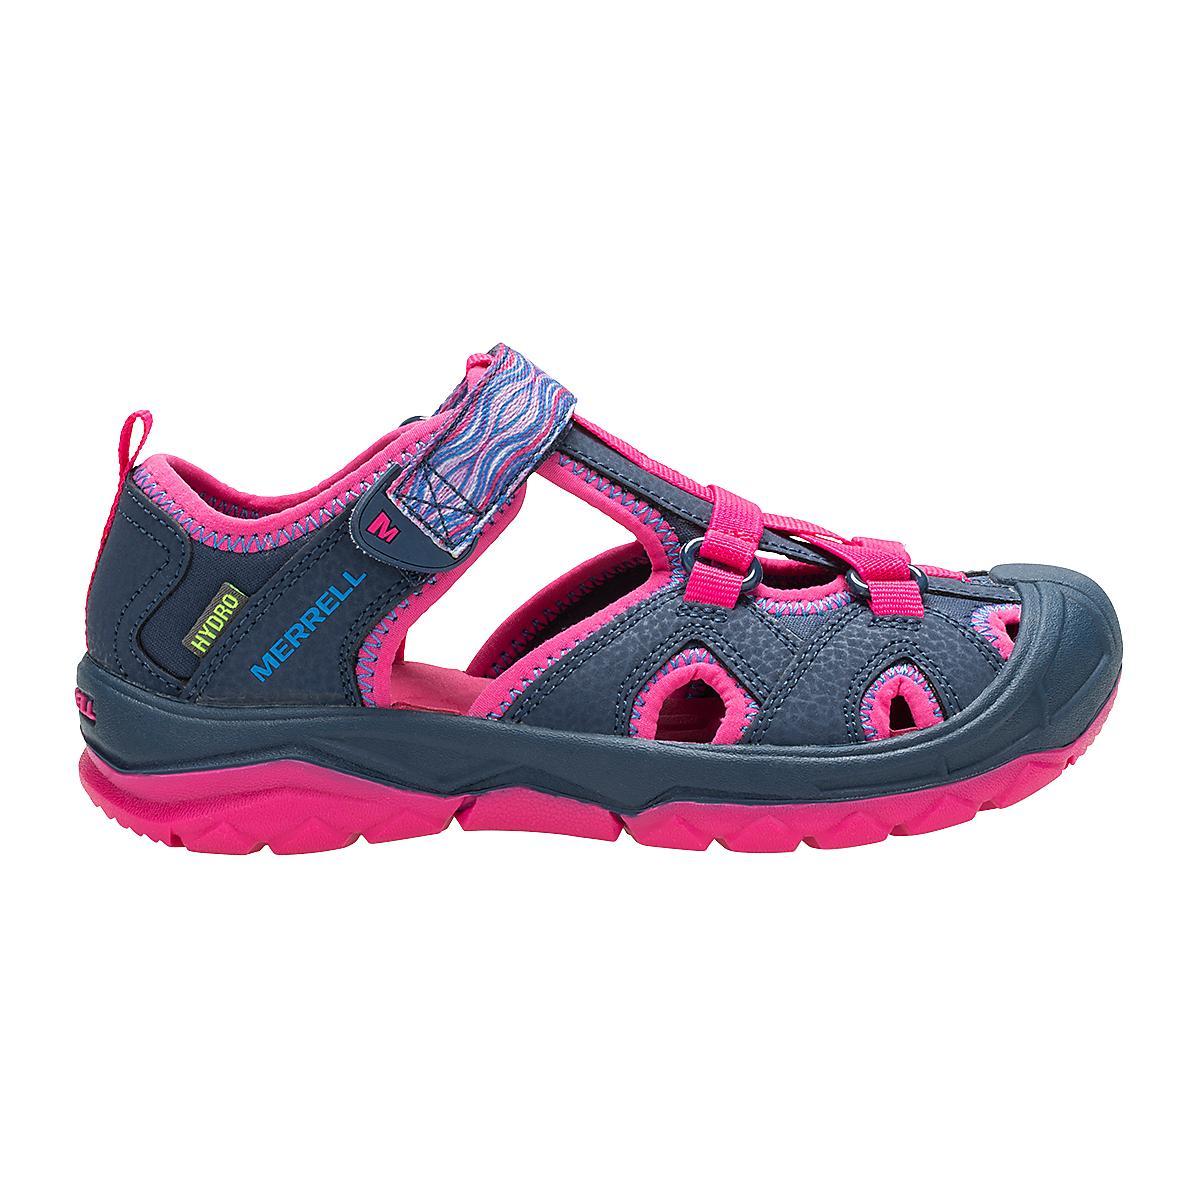 e2f4d30efa67 Kids Merrell Hydro Sandals Shoe